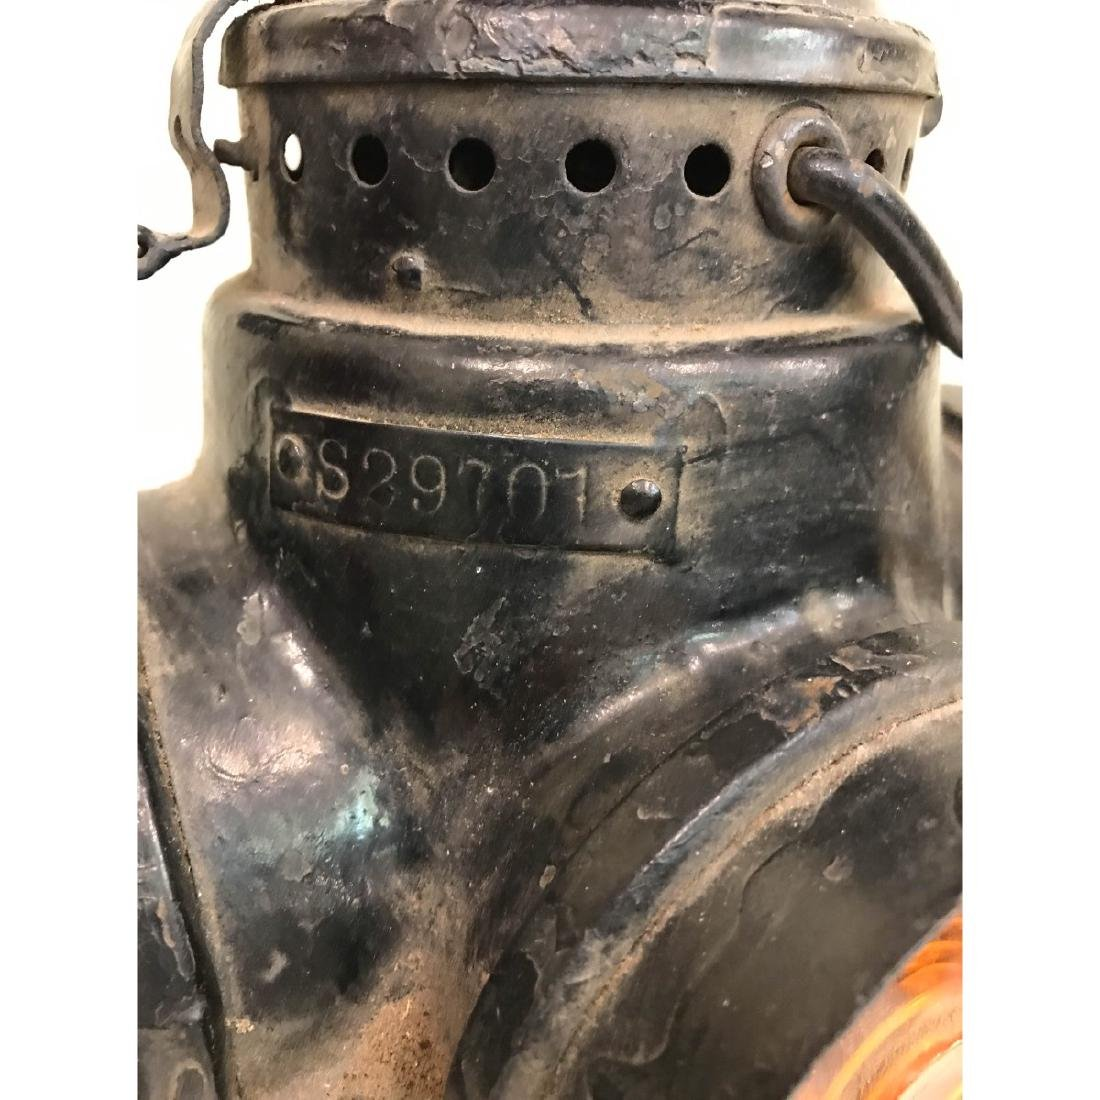 Antique Trunk Lamp, Lantern - 3